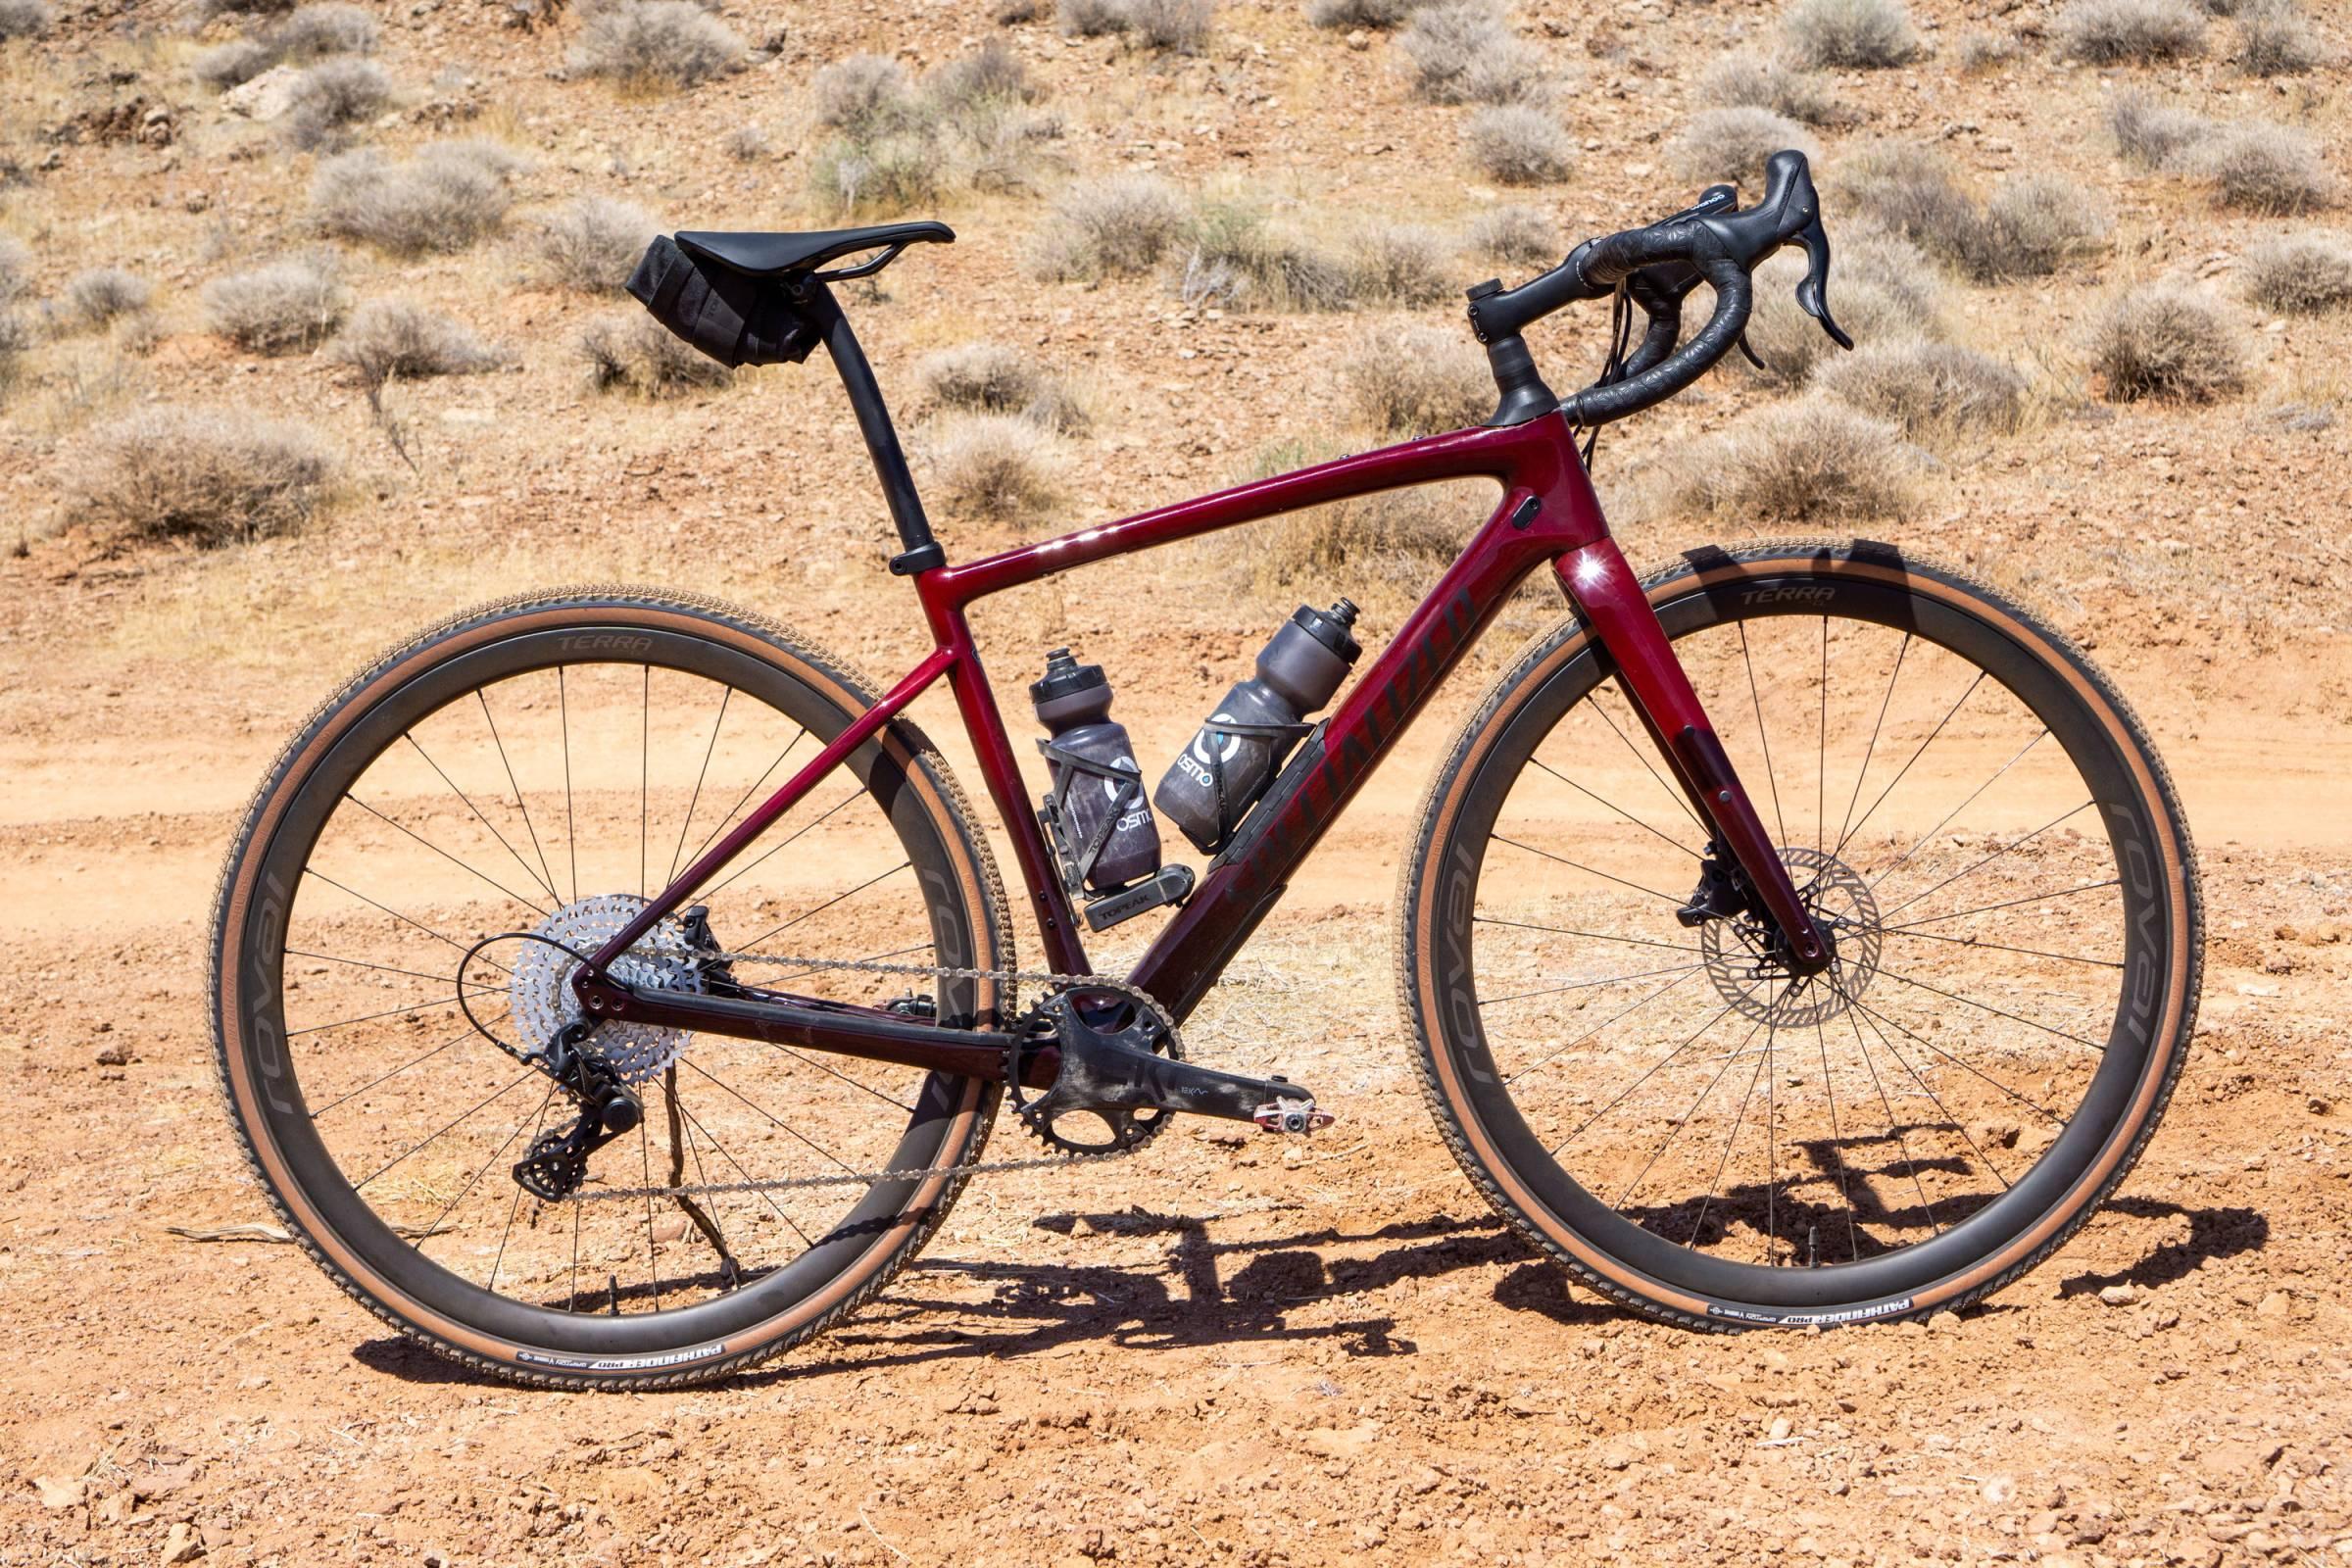 GearJunkie best gravel bike selection, Specialized Diverge Pro Carbon